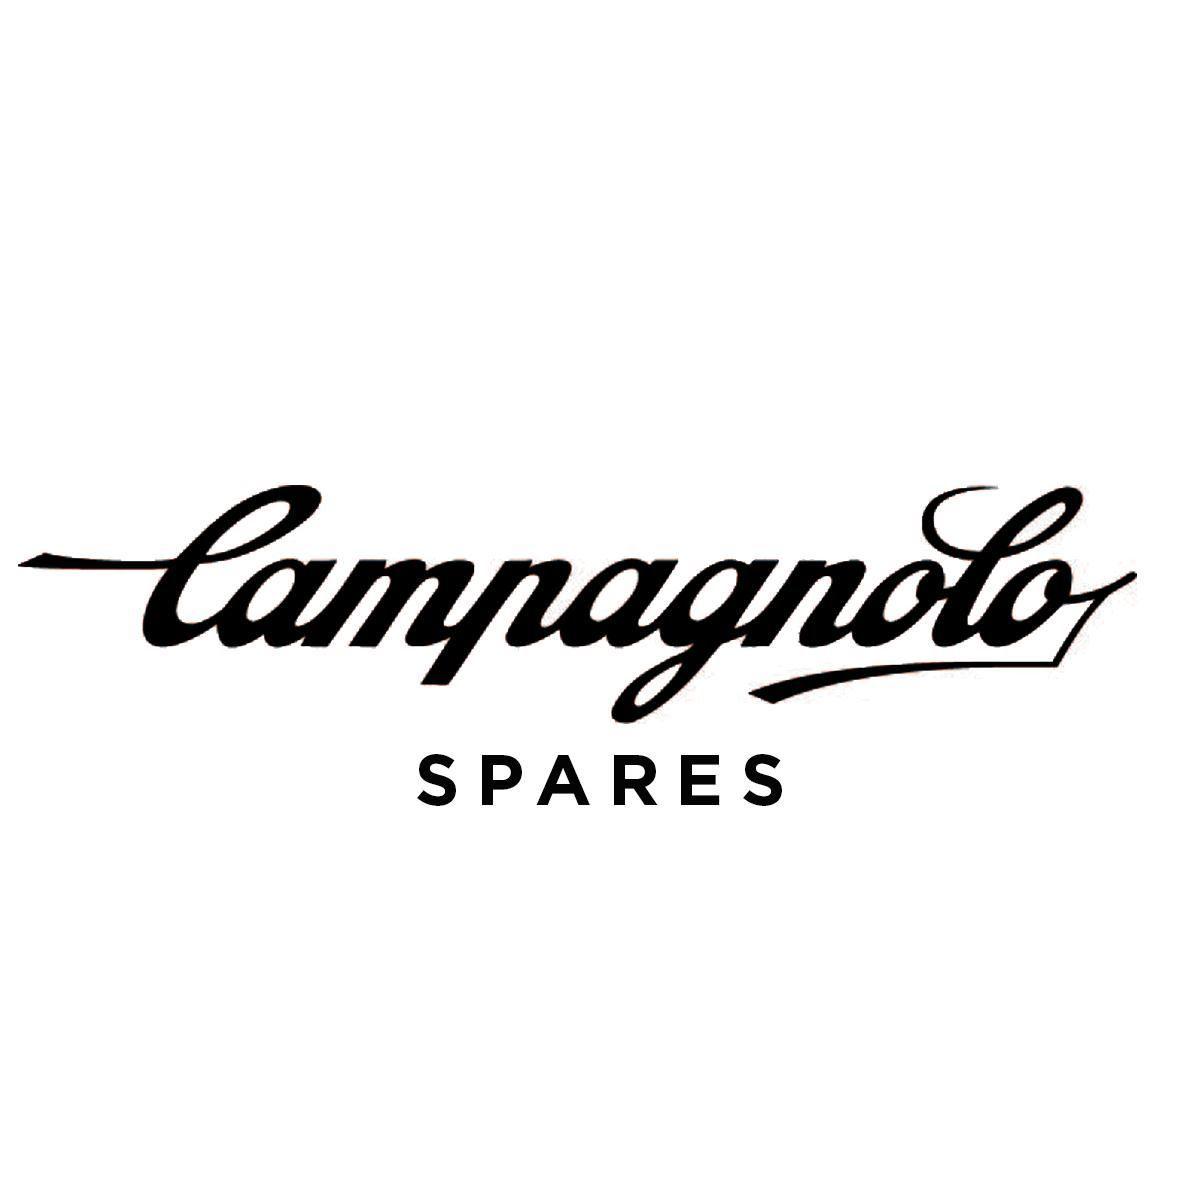 Campagnolo Spares Rear Derailleur Rd-At115 - Cable Adjuster 9 Speed: